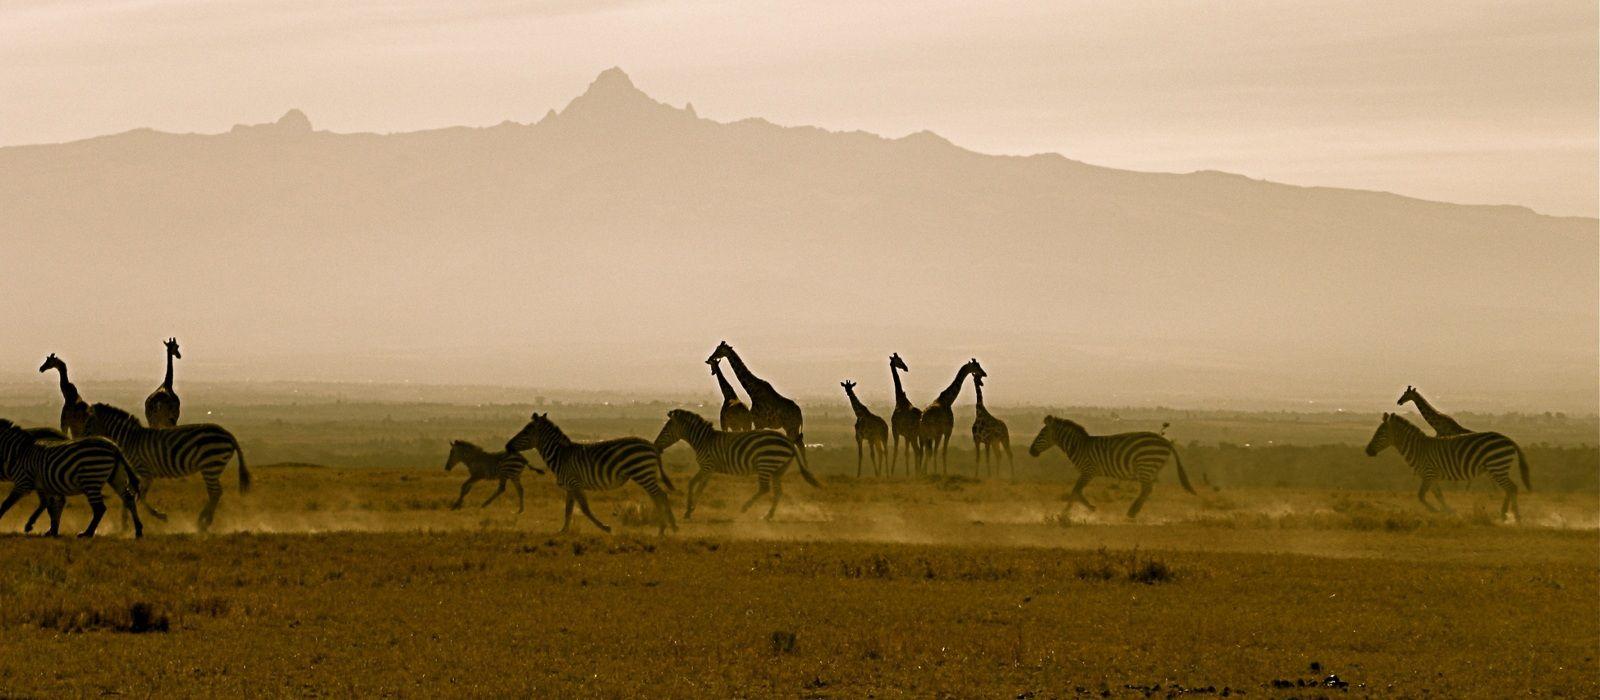 Destination Mt. Kenya Kenya